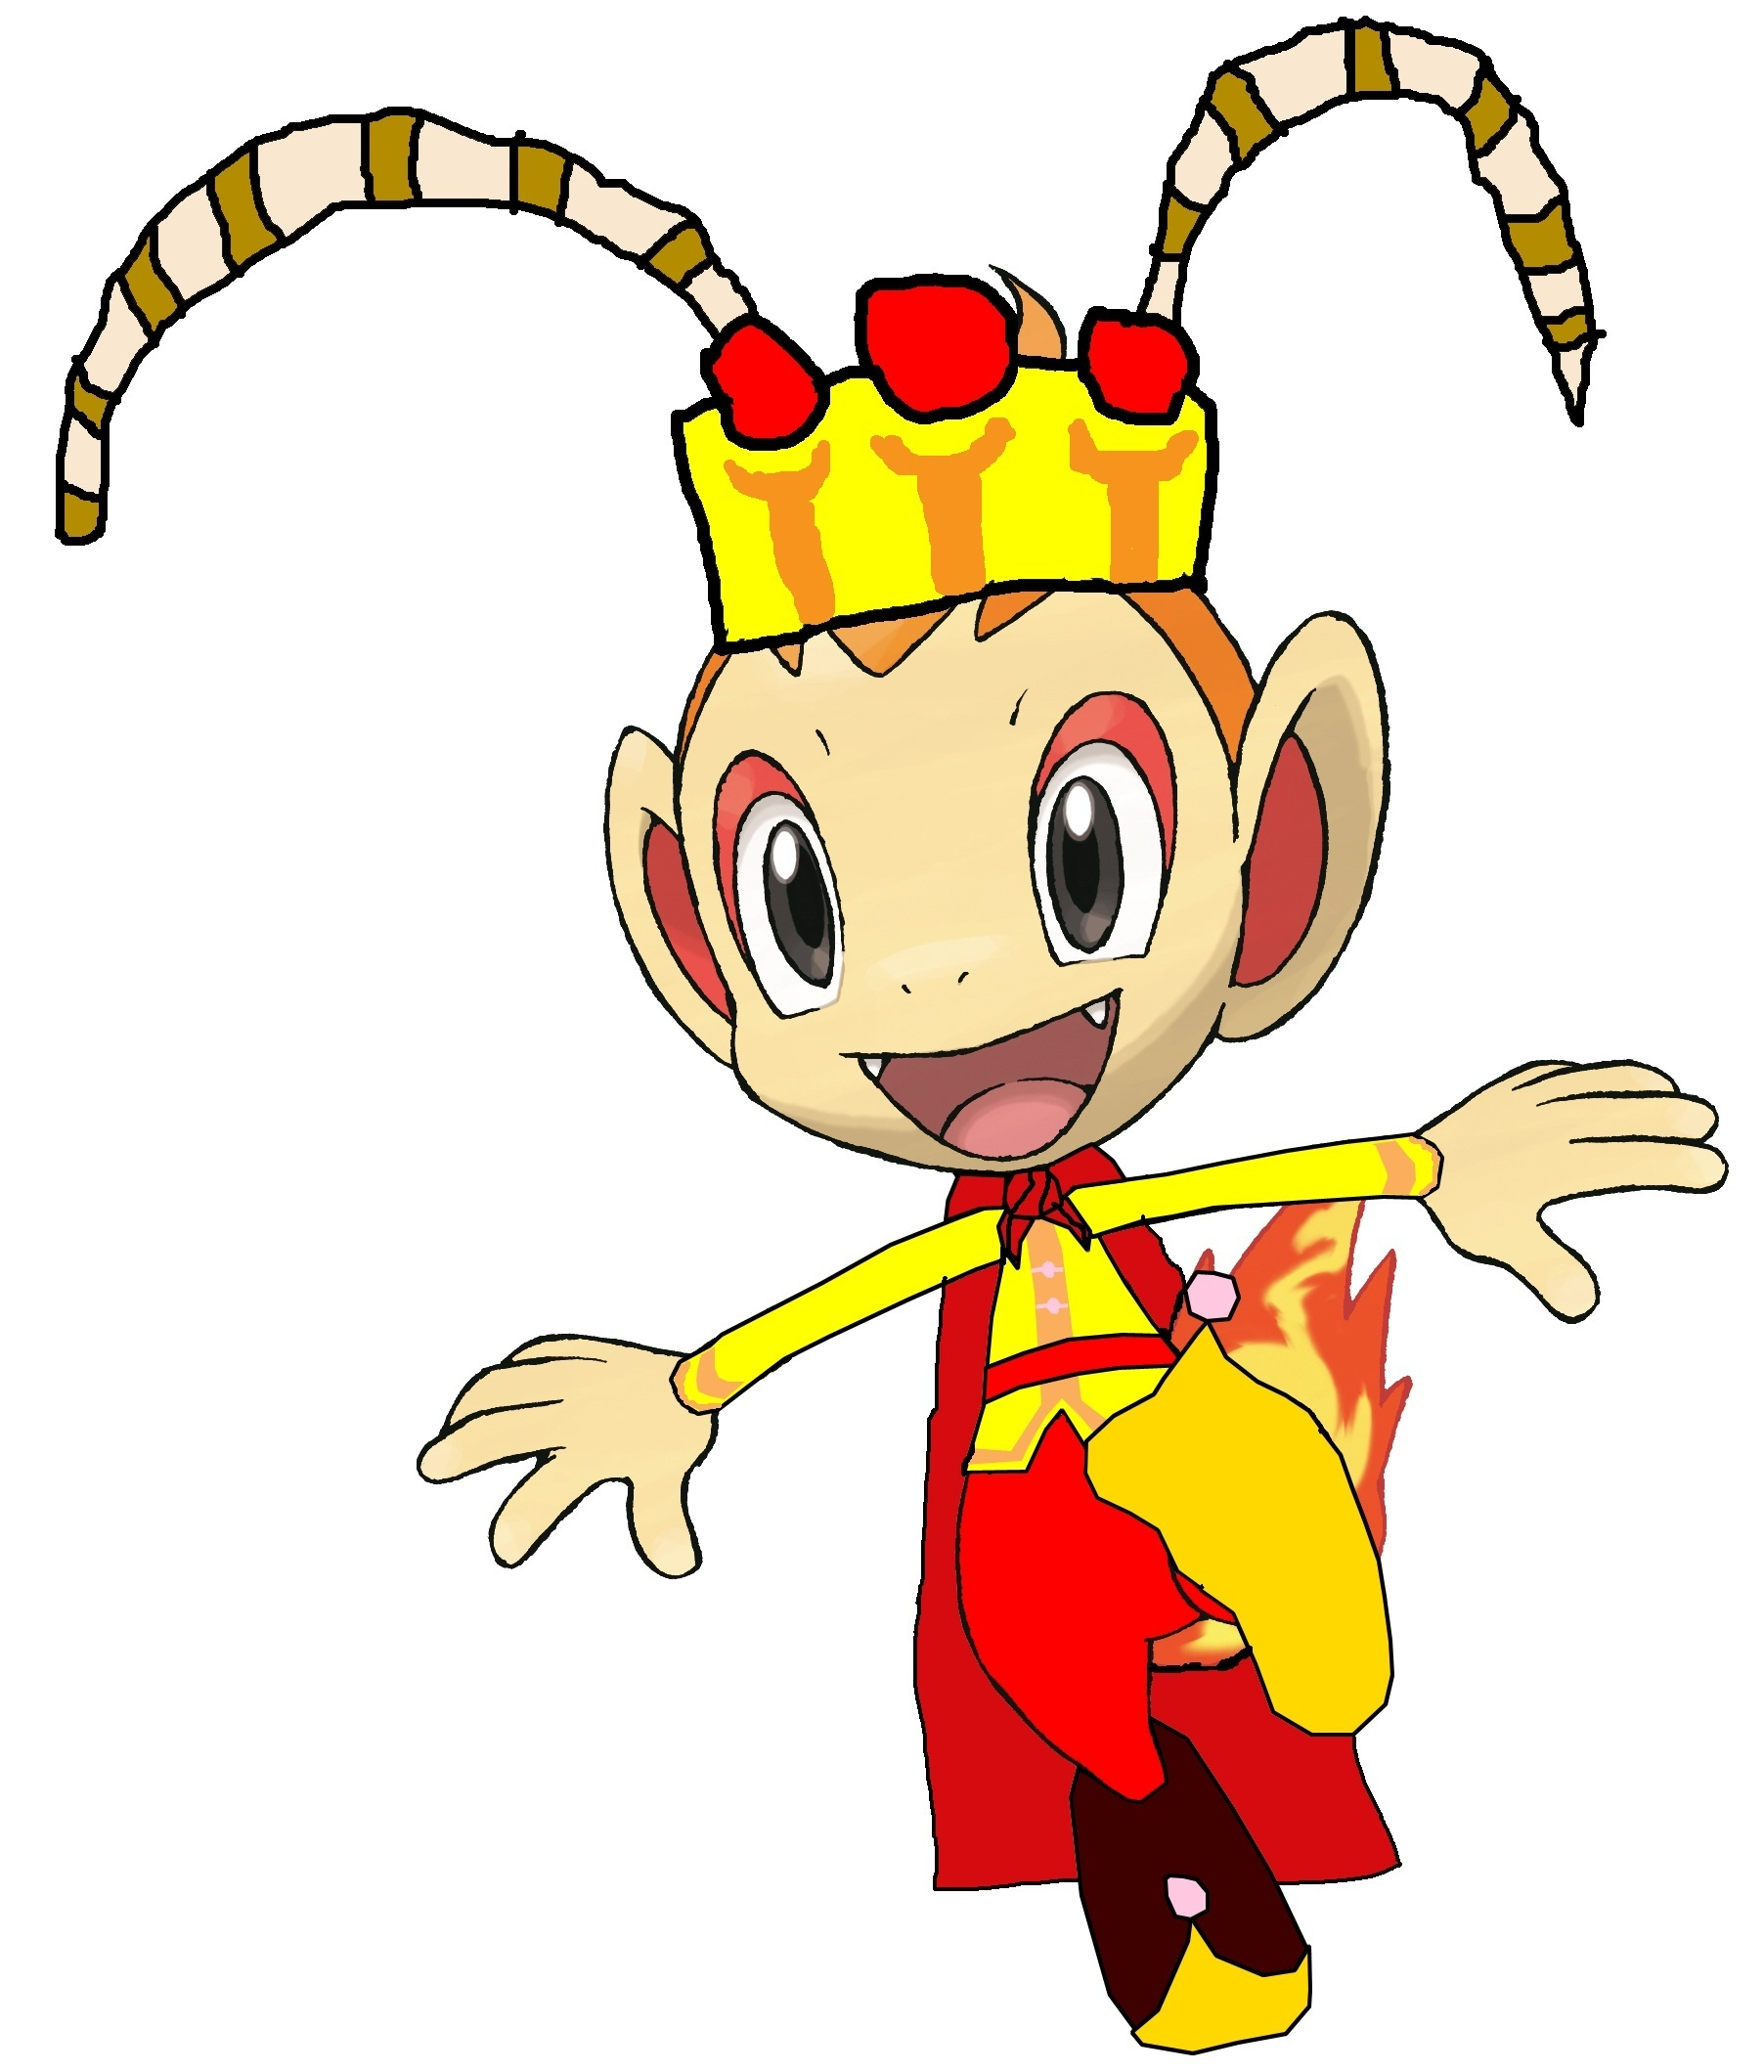 King Chimchar